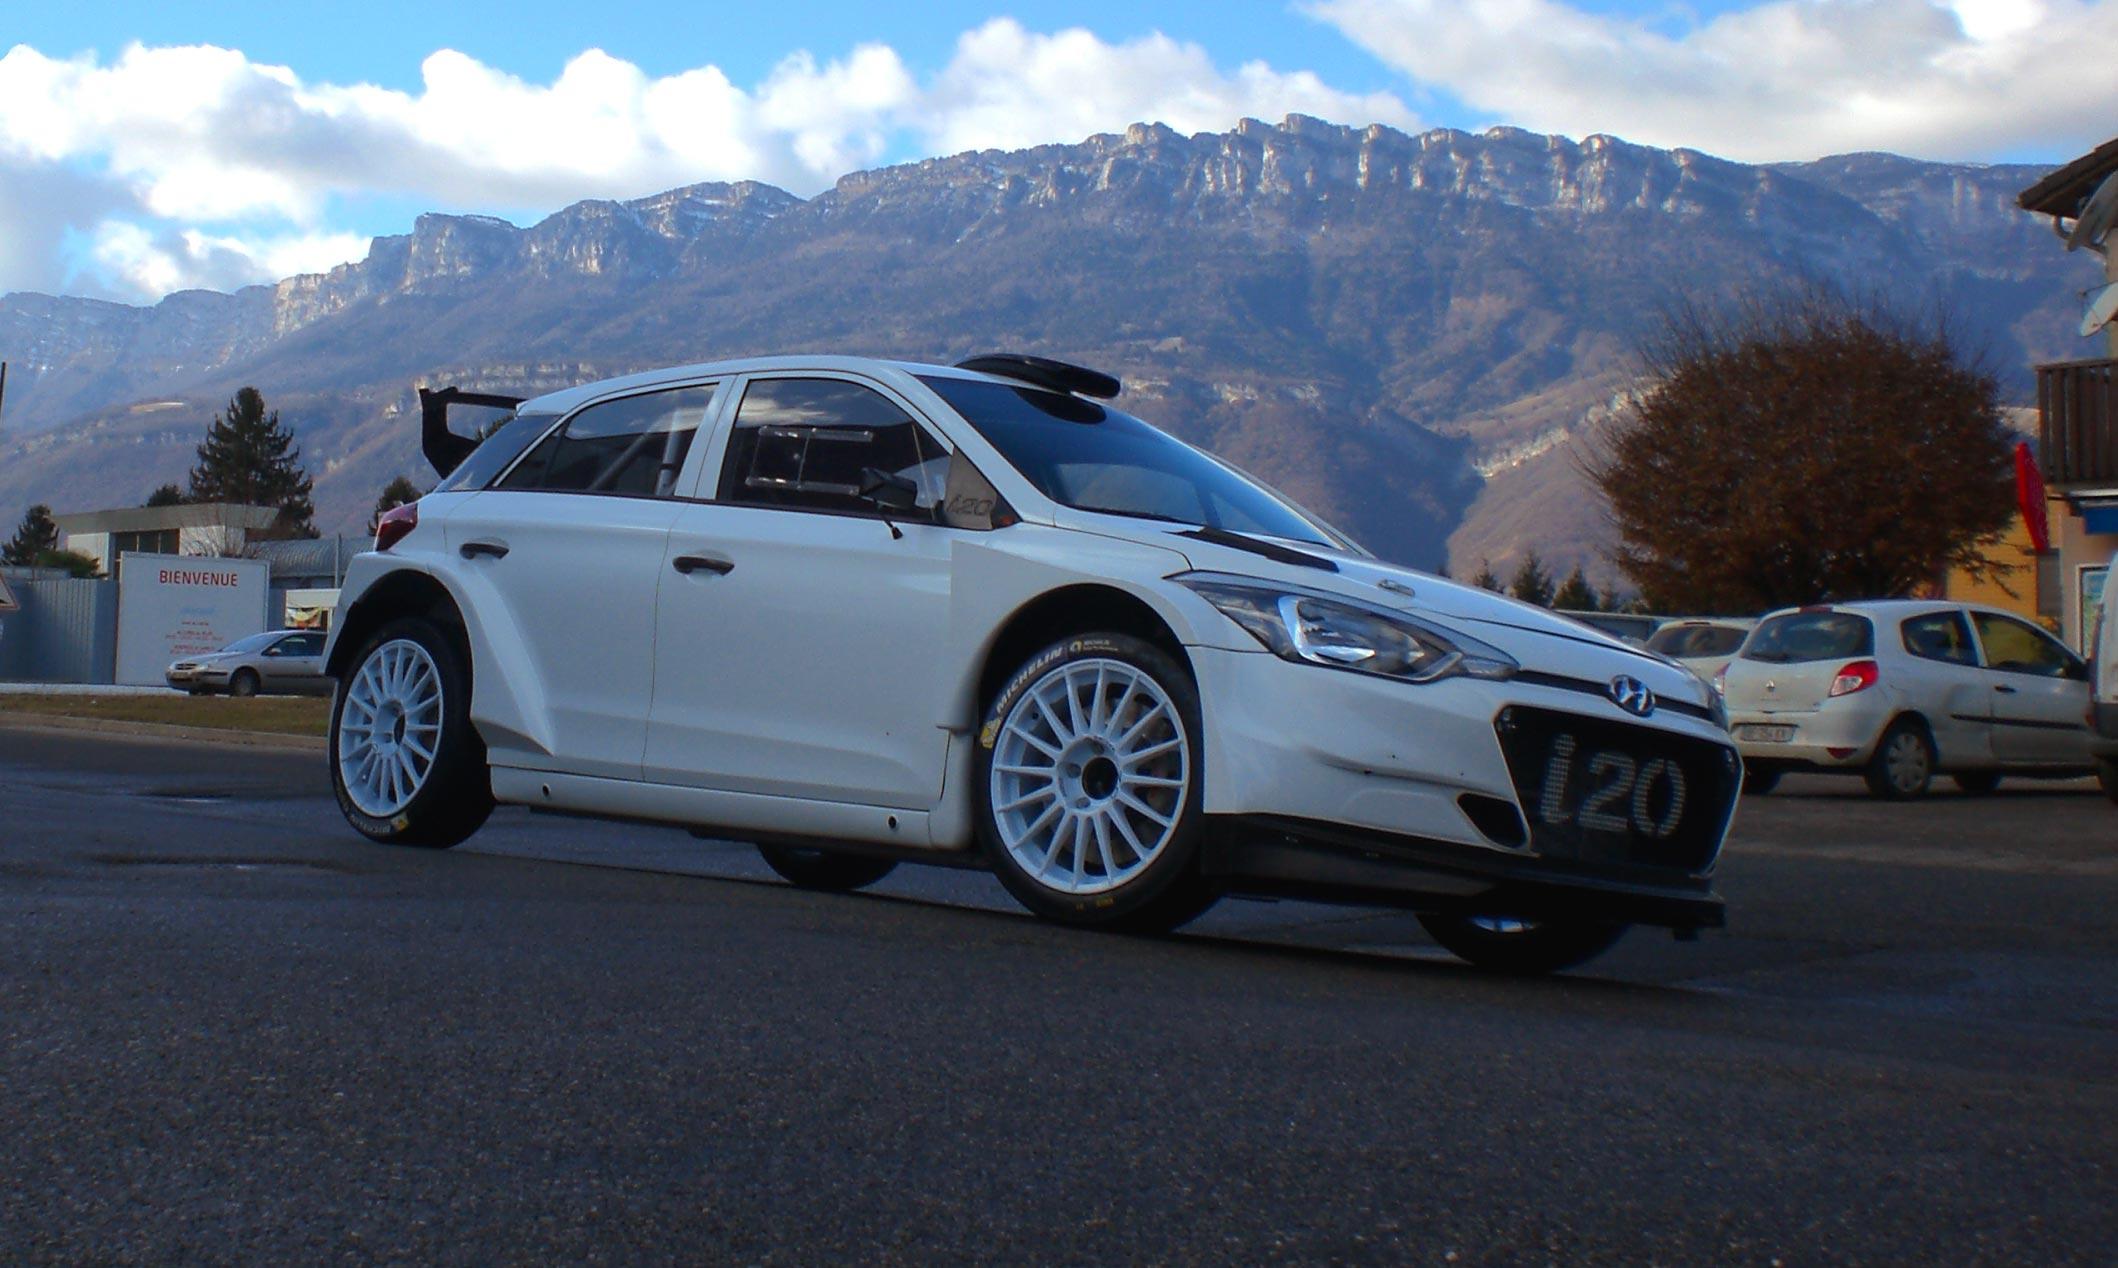 Hyundai i20 rallye compétition location sport route